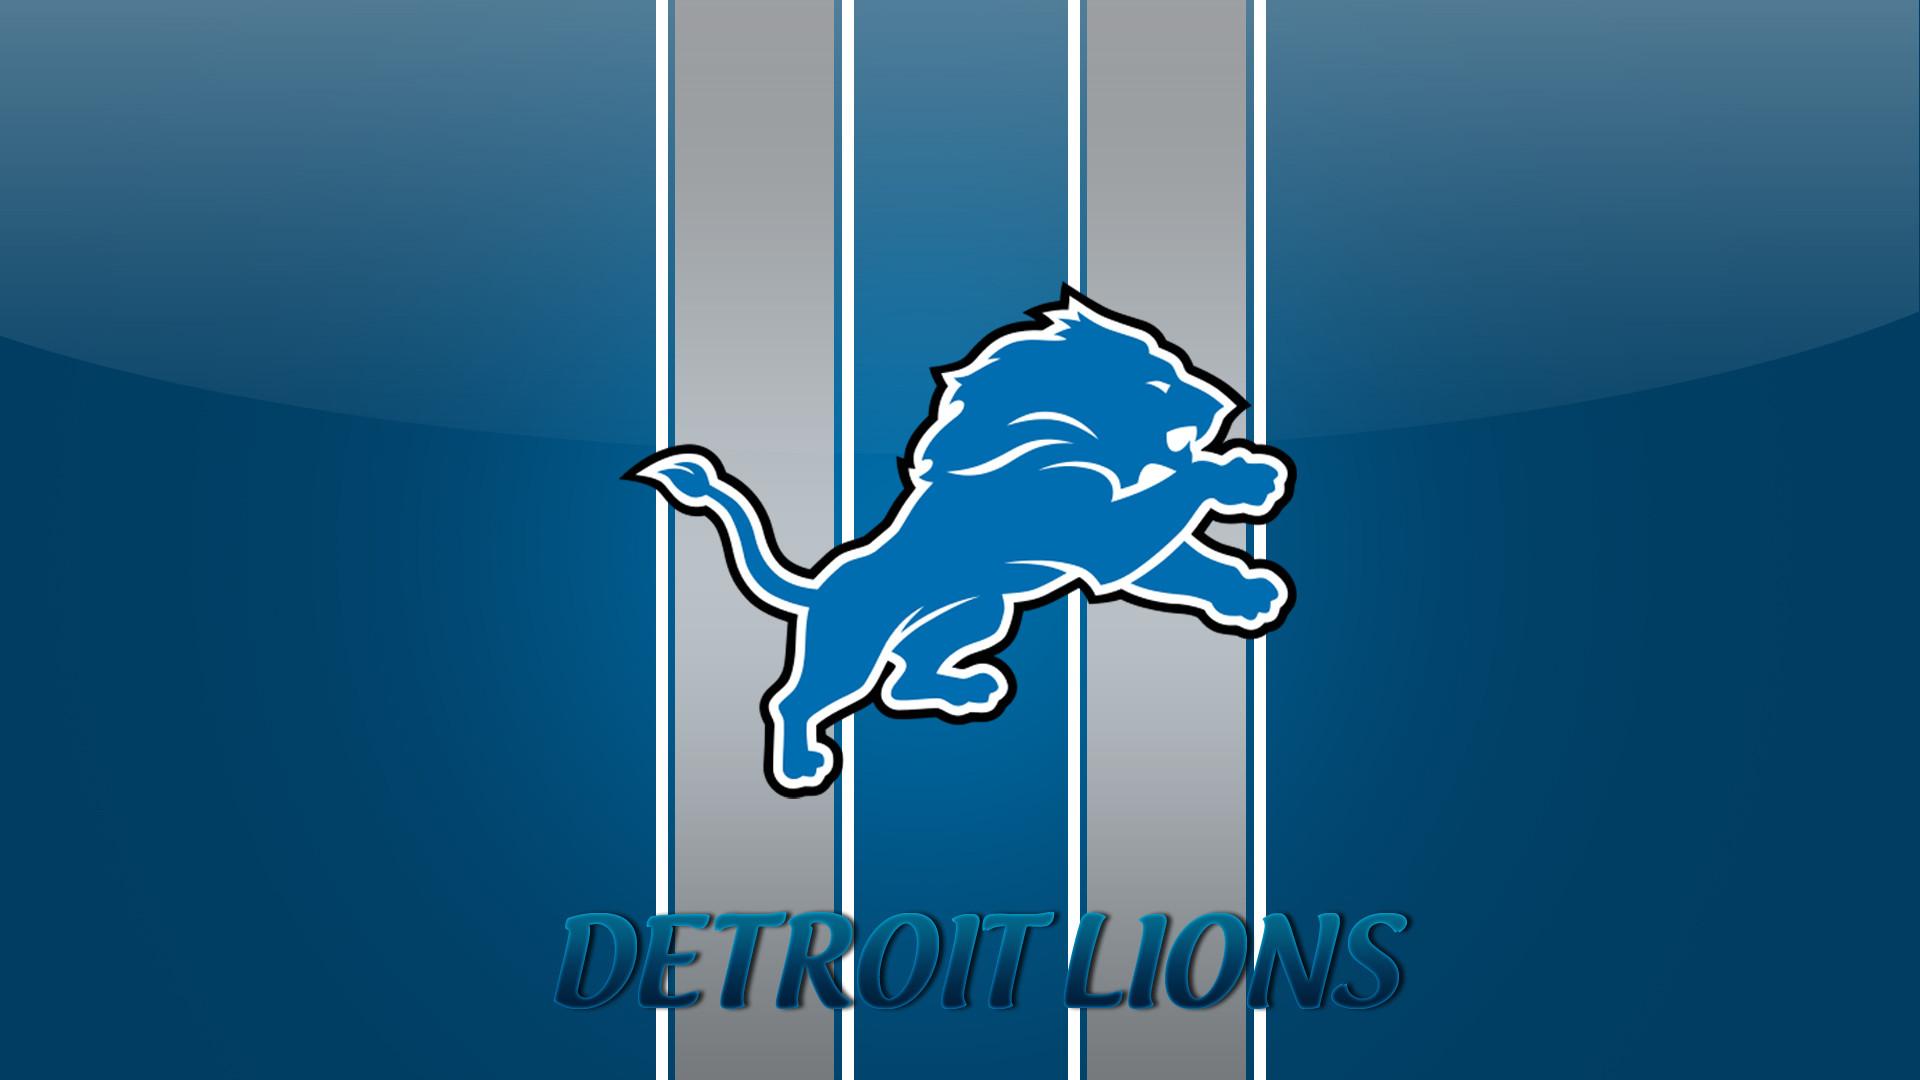 Best HD Detroit Lions Wallpapers feelgrPH   HD Wallpapers   Pinterest   Detroit  lions wallpaper, Lion wallpaper and Wallpaper